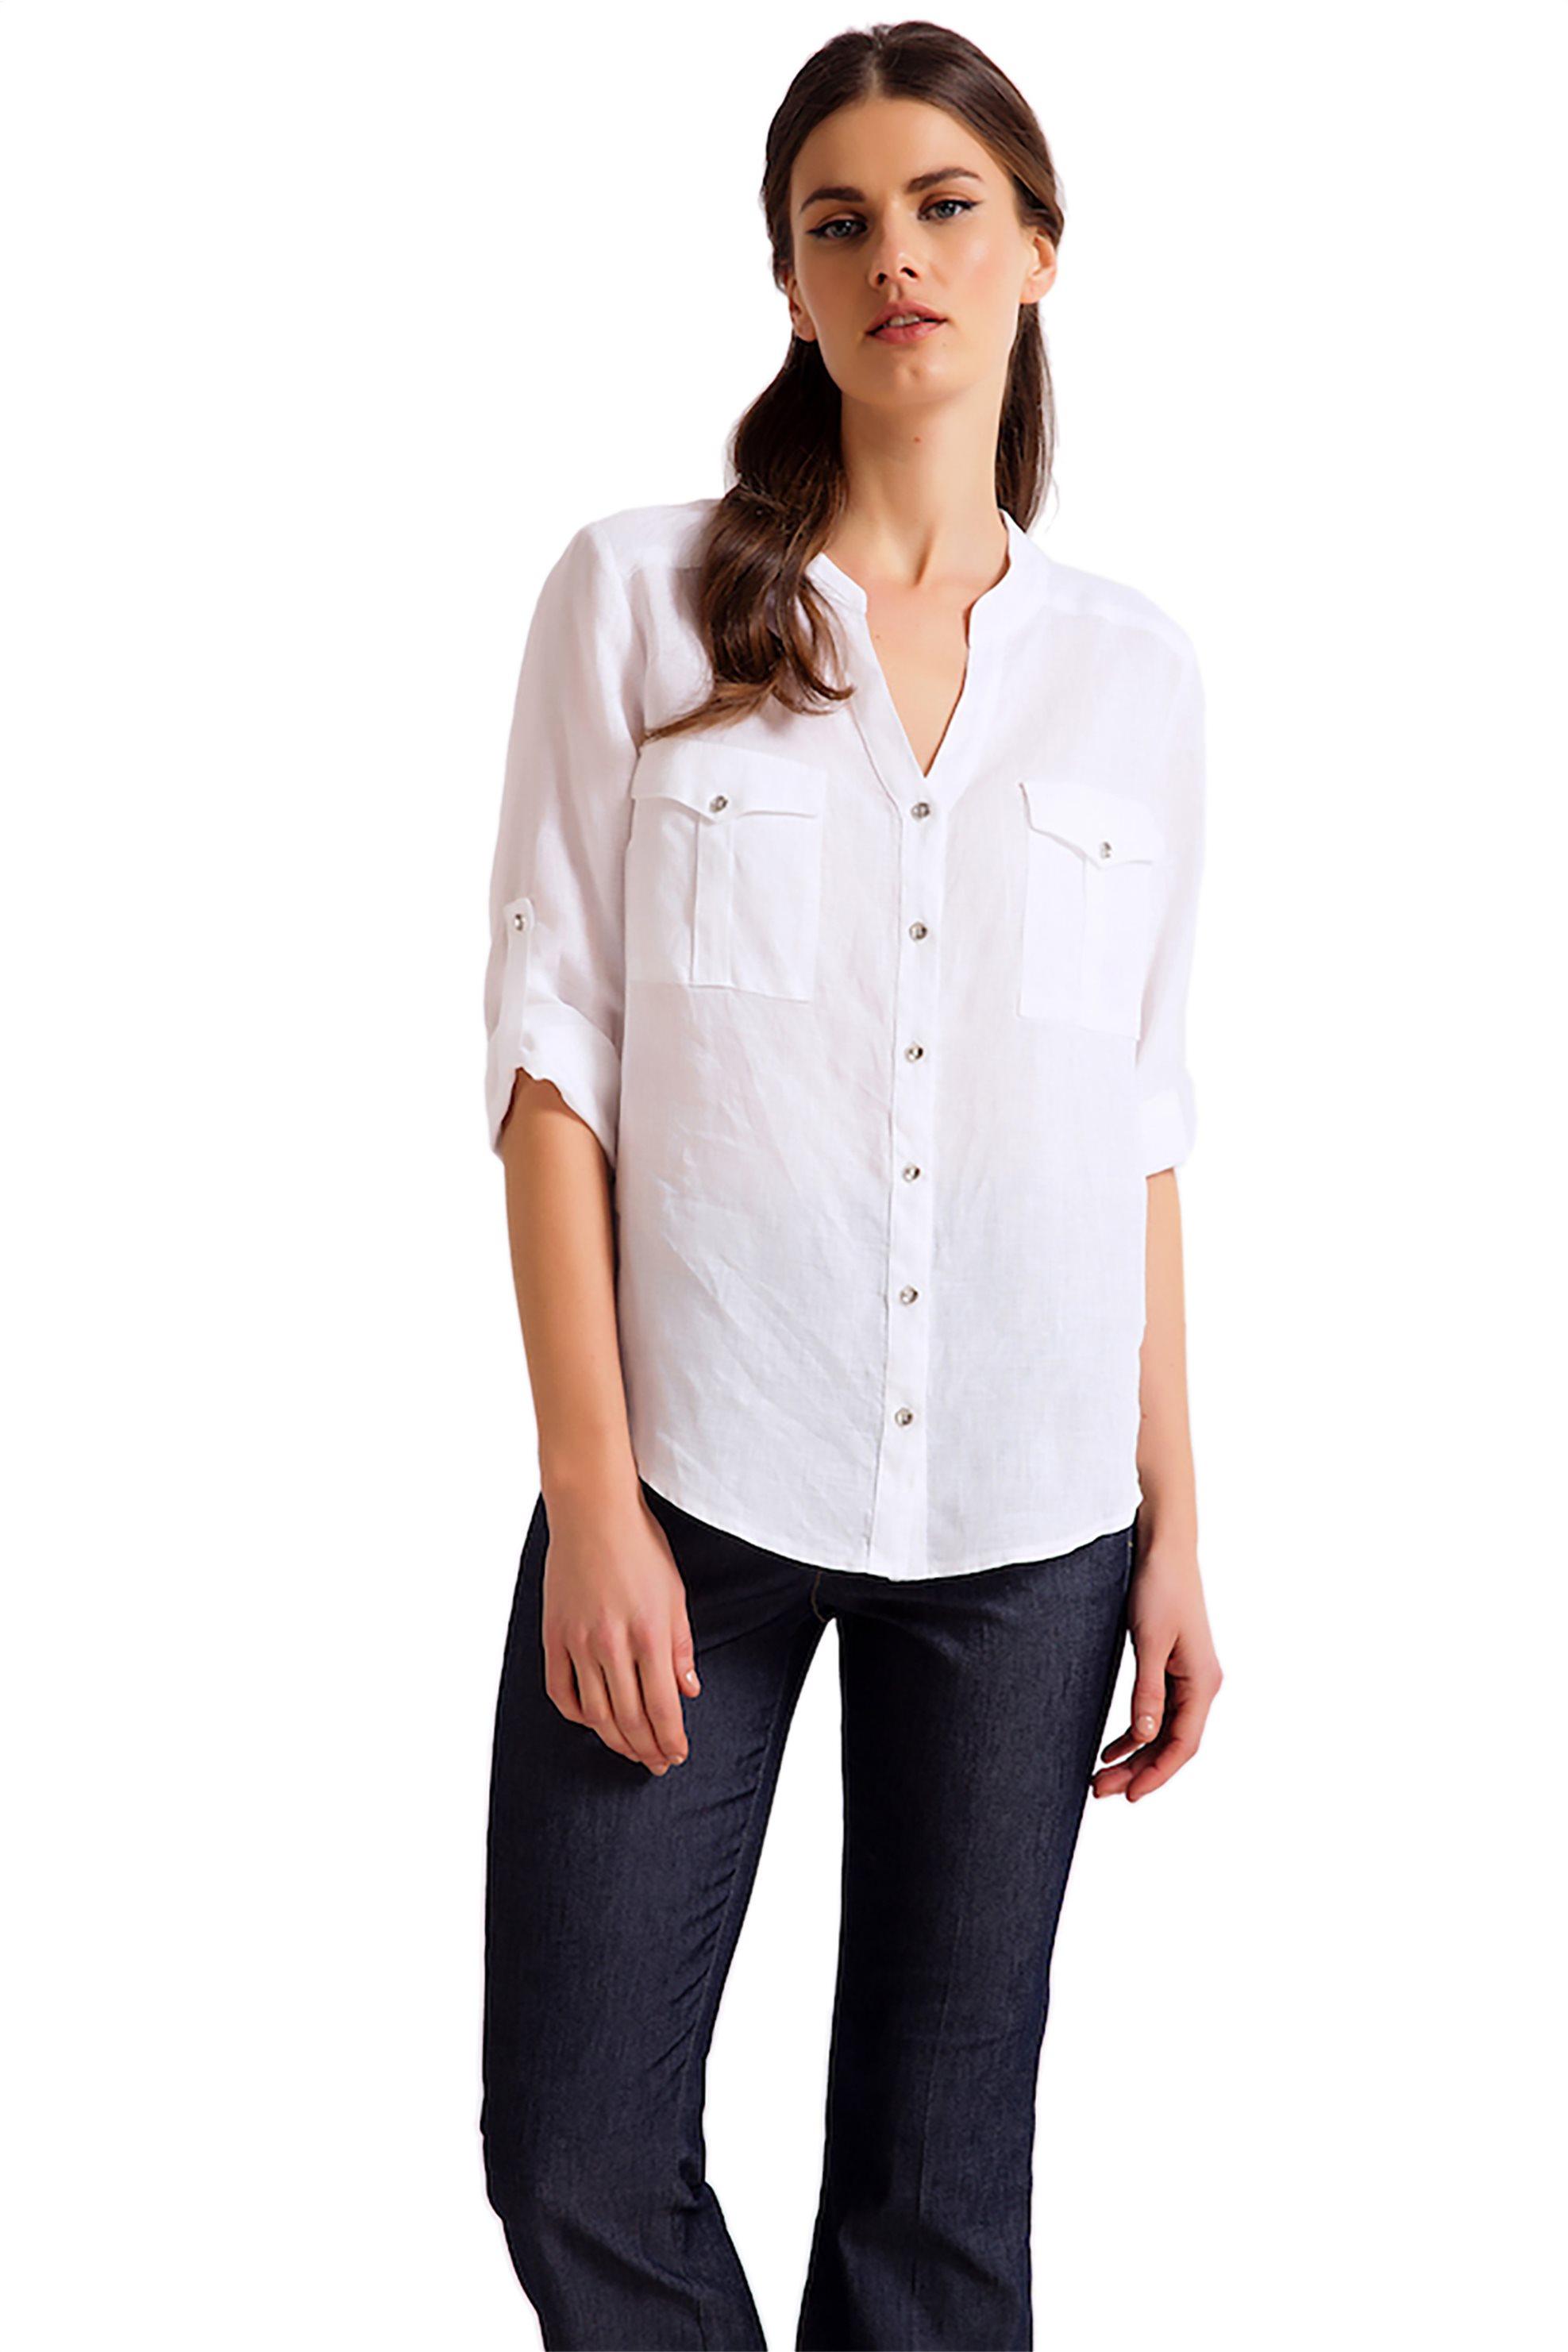 192e8c45f5c9 Γυναικεία   Ρούχα   Πουκάμισα   Πουκάμισο άσπρο μαύρο γυναικείο ...